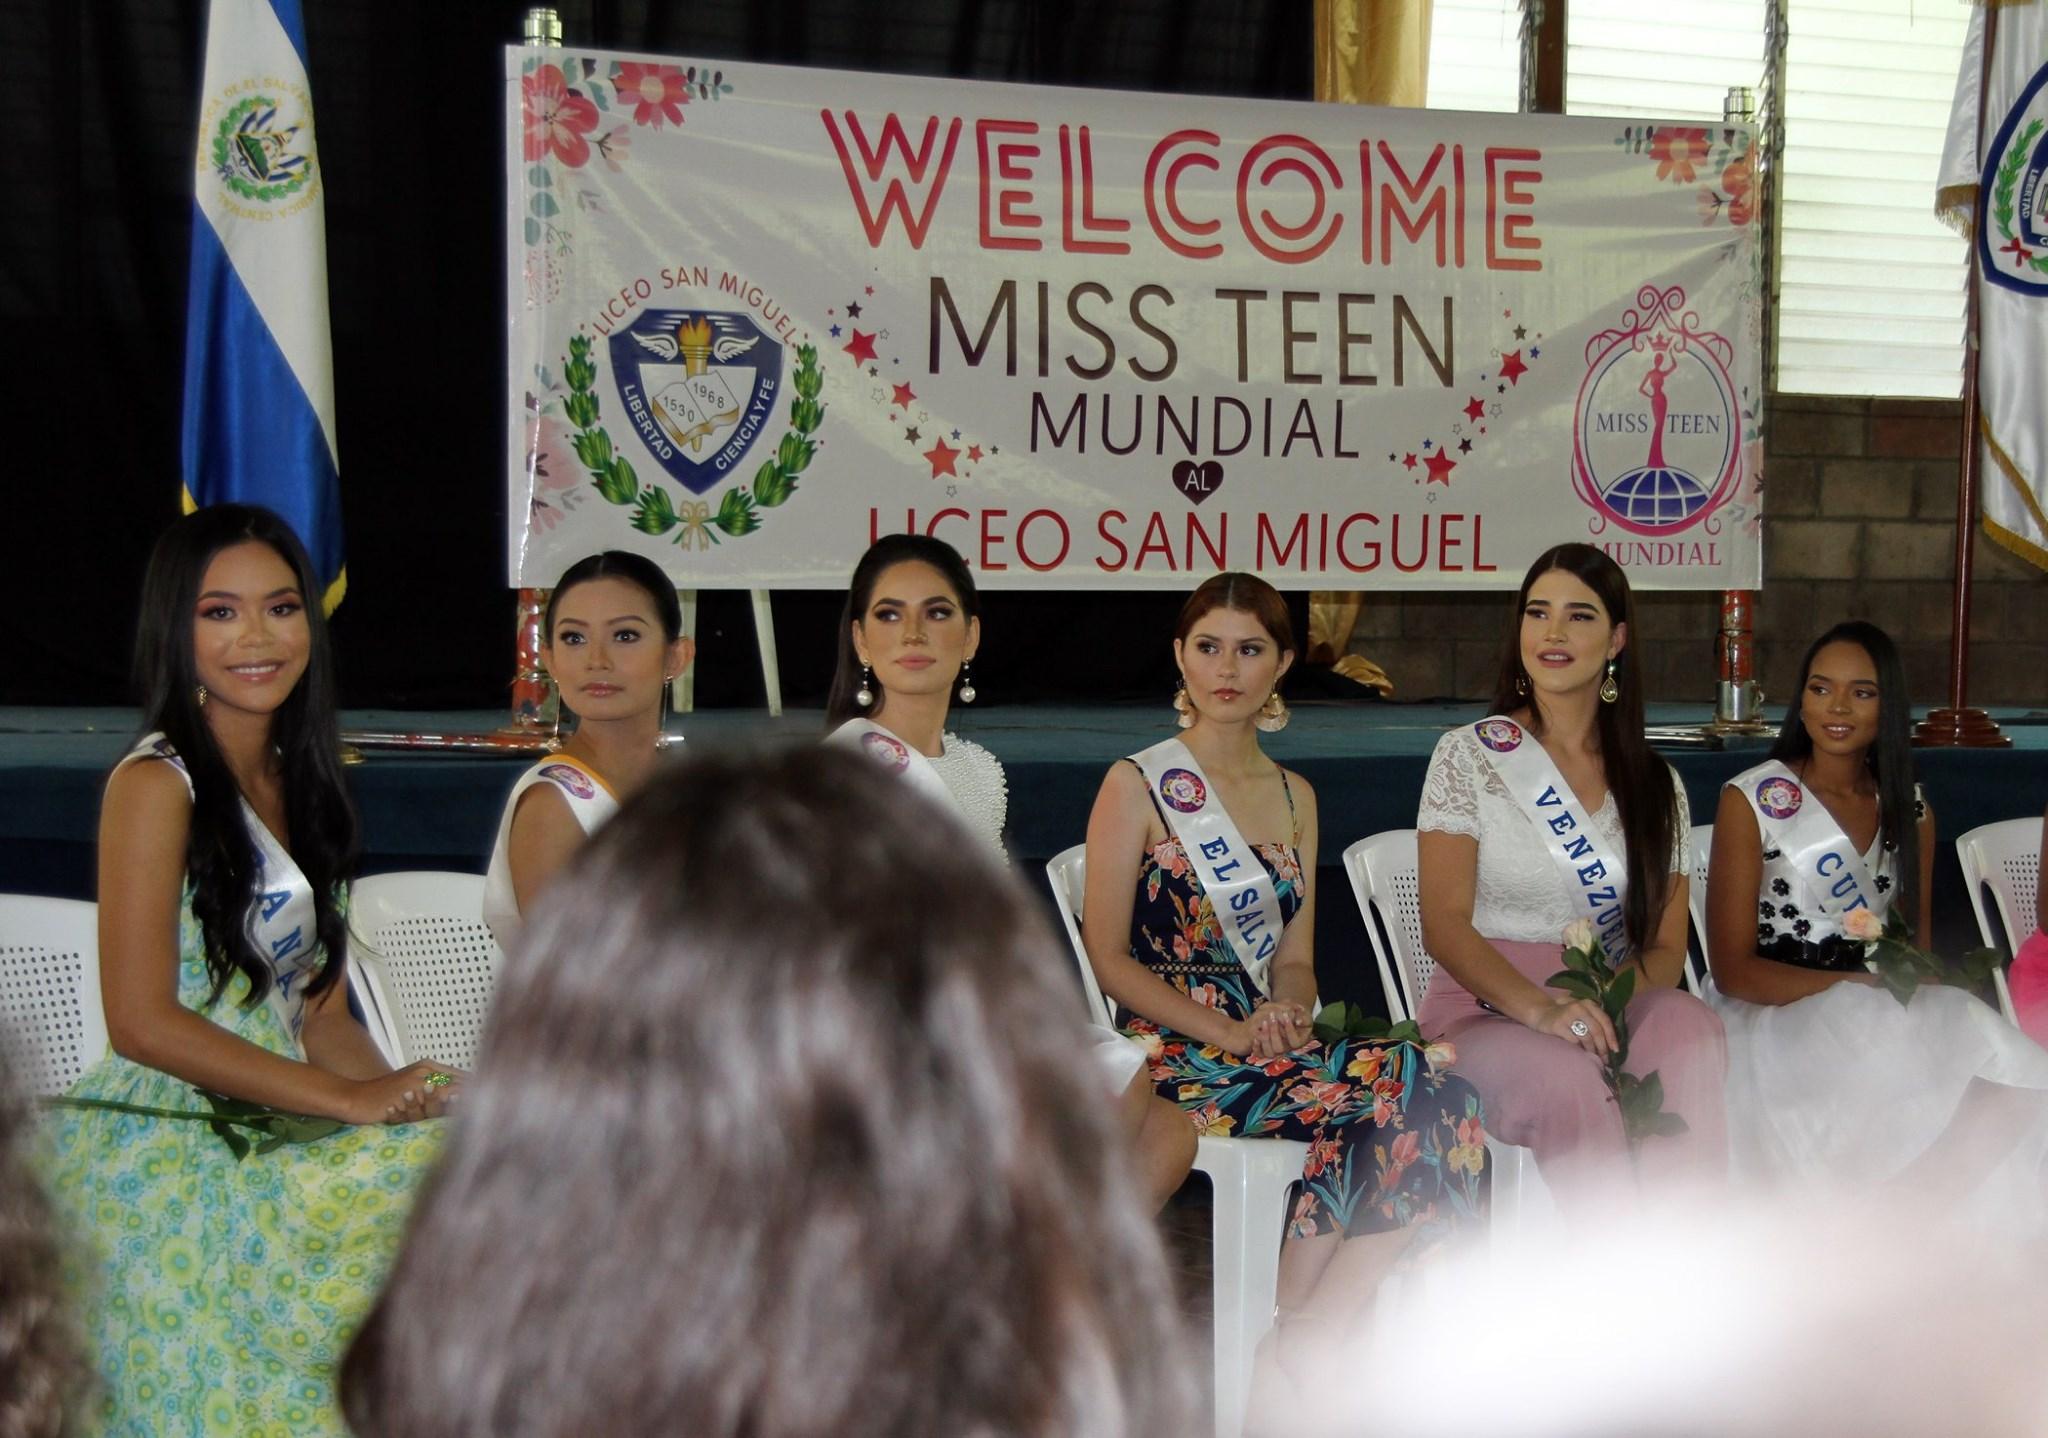 daniela di venere, top 12 de miss teen mundial 2019. - Página 5 61028610